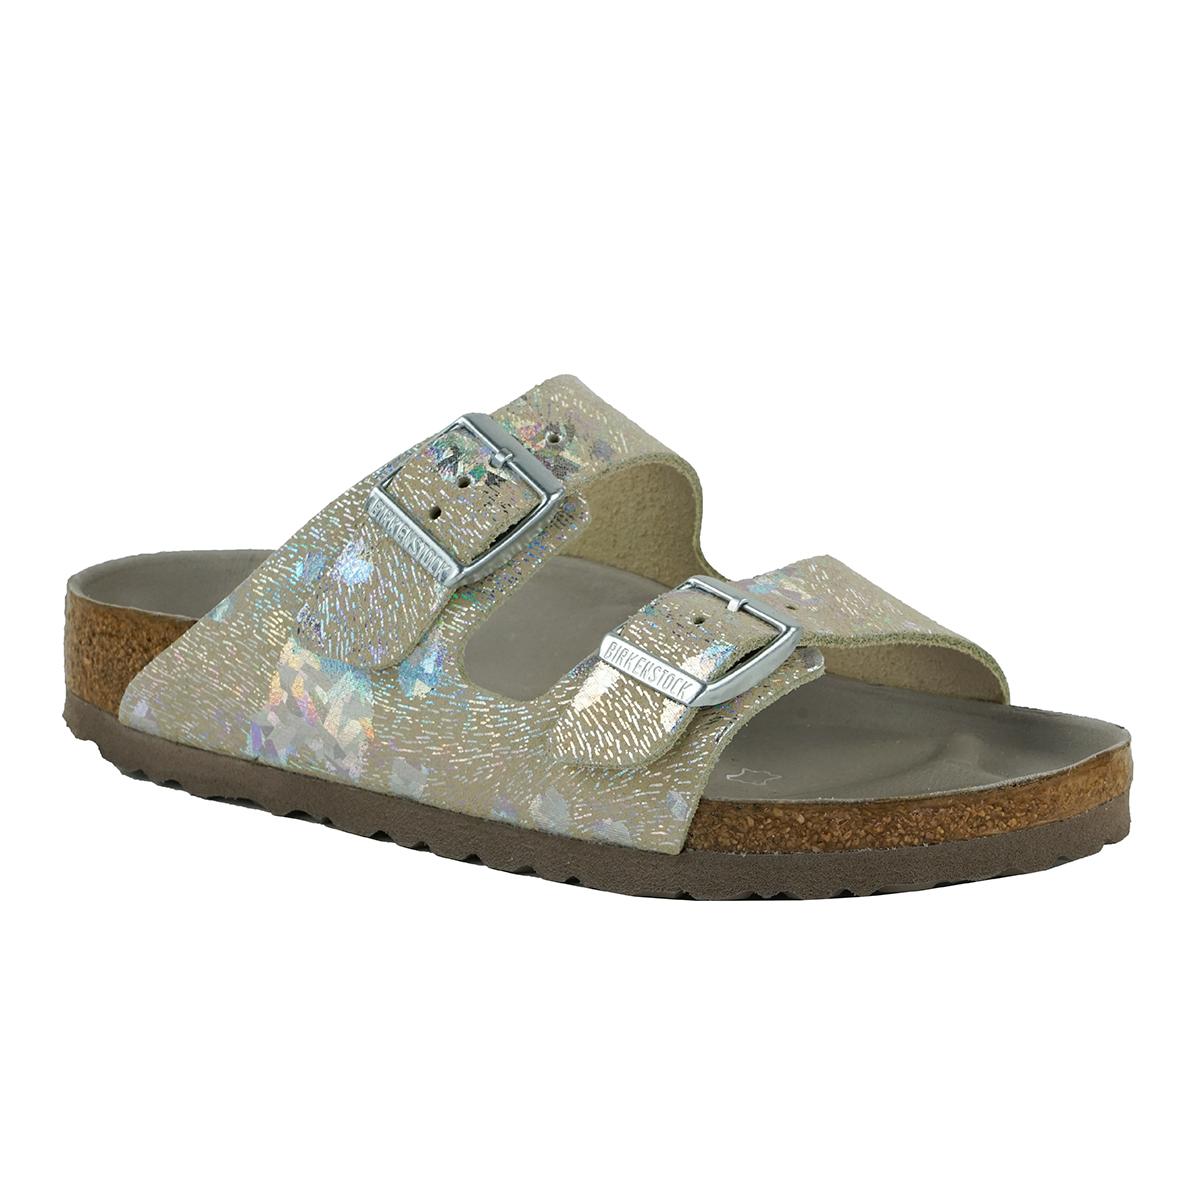 6f46046a1b2e Birkenstock Arizona Leather Sandals Metallic Silver 38 886925859813 ...